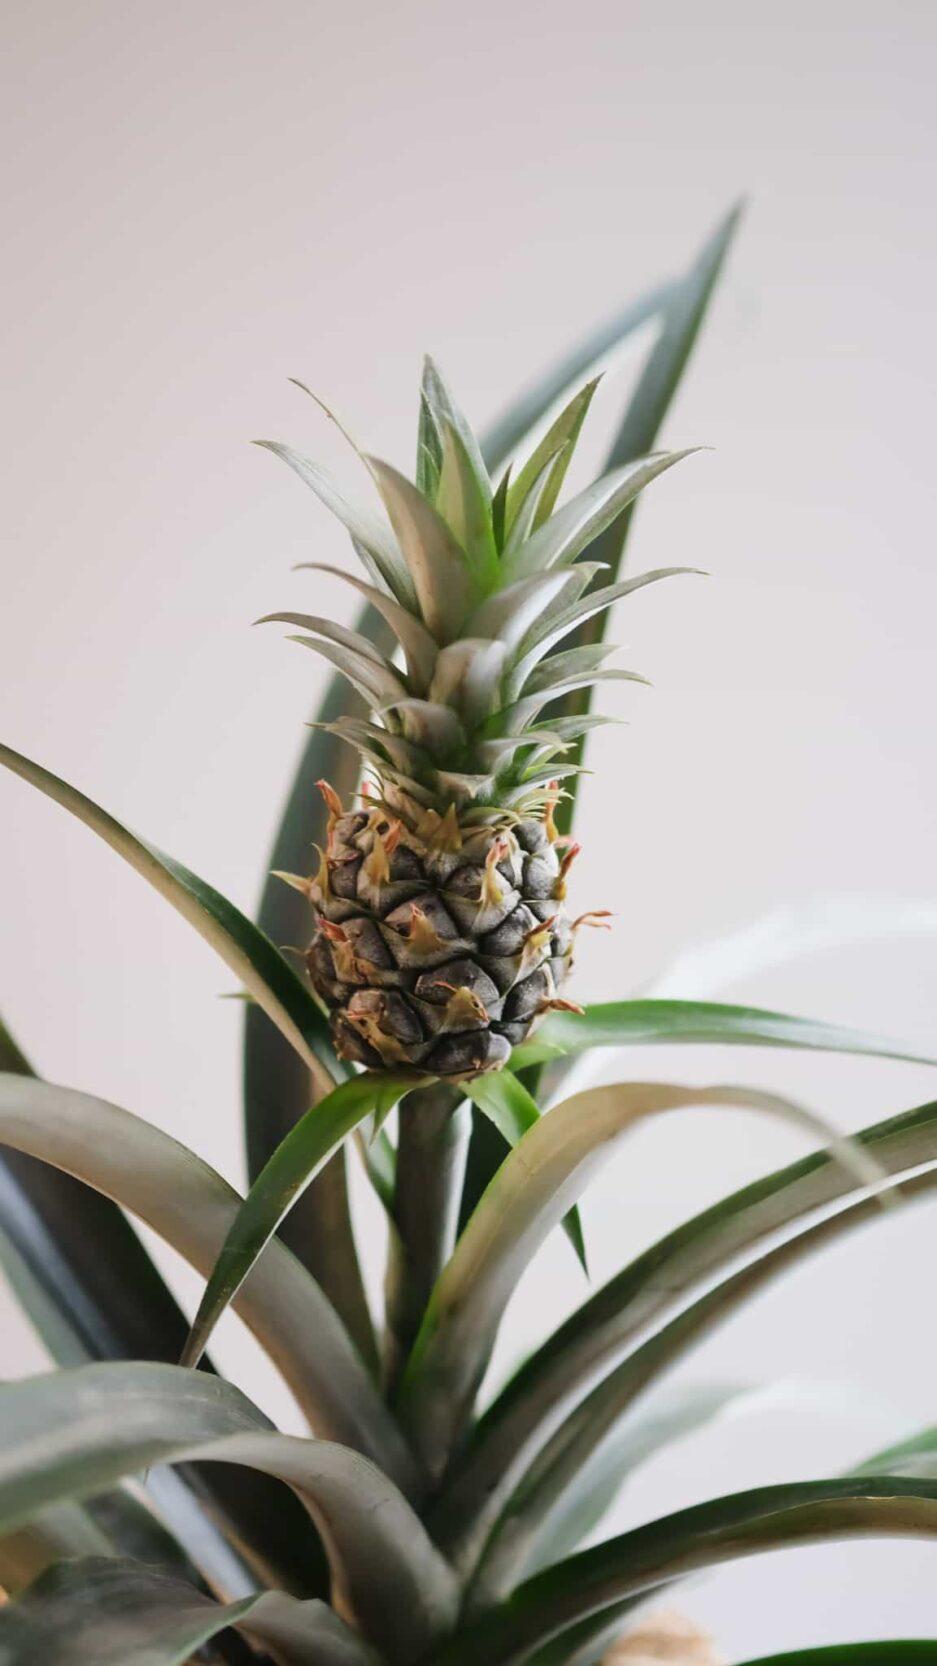 Pineapple Ananas Bitkisi